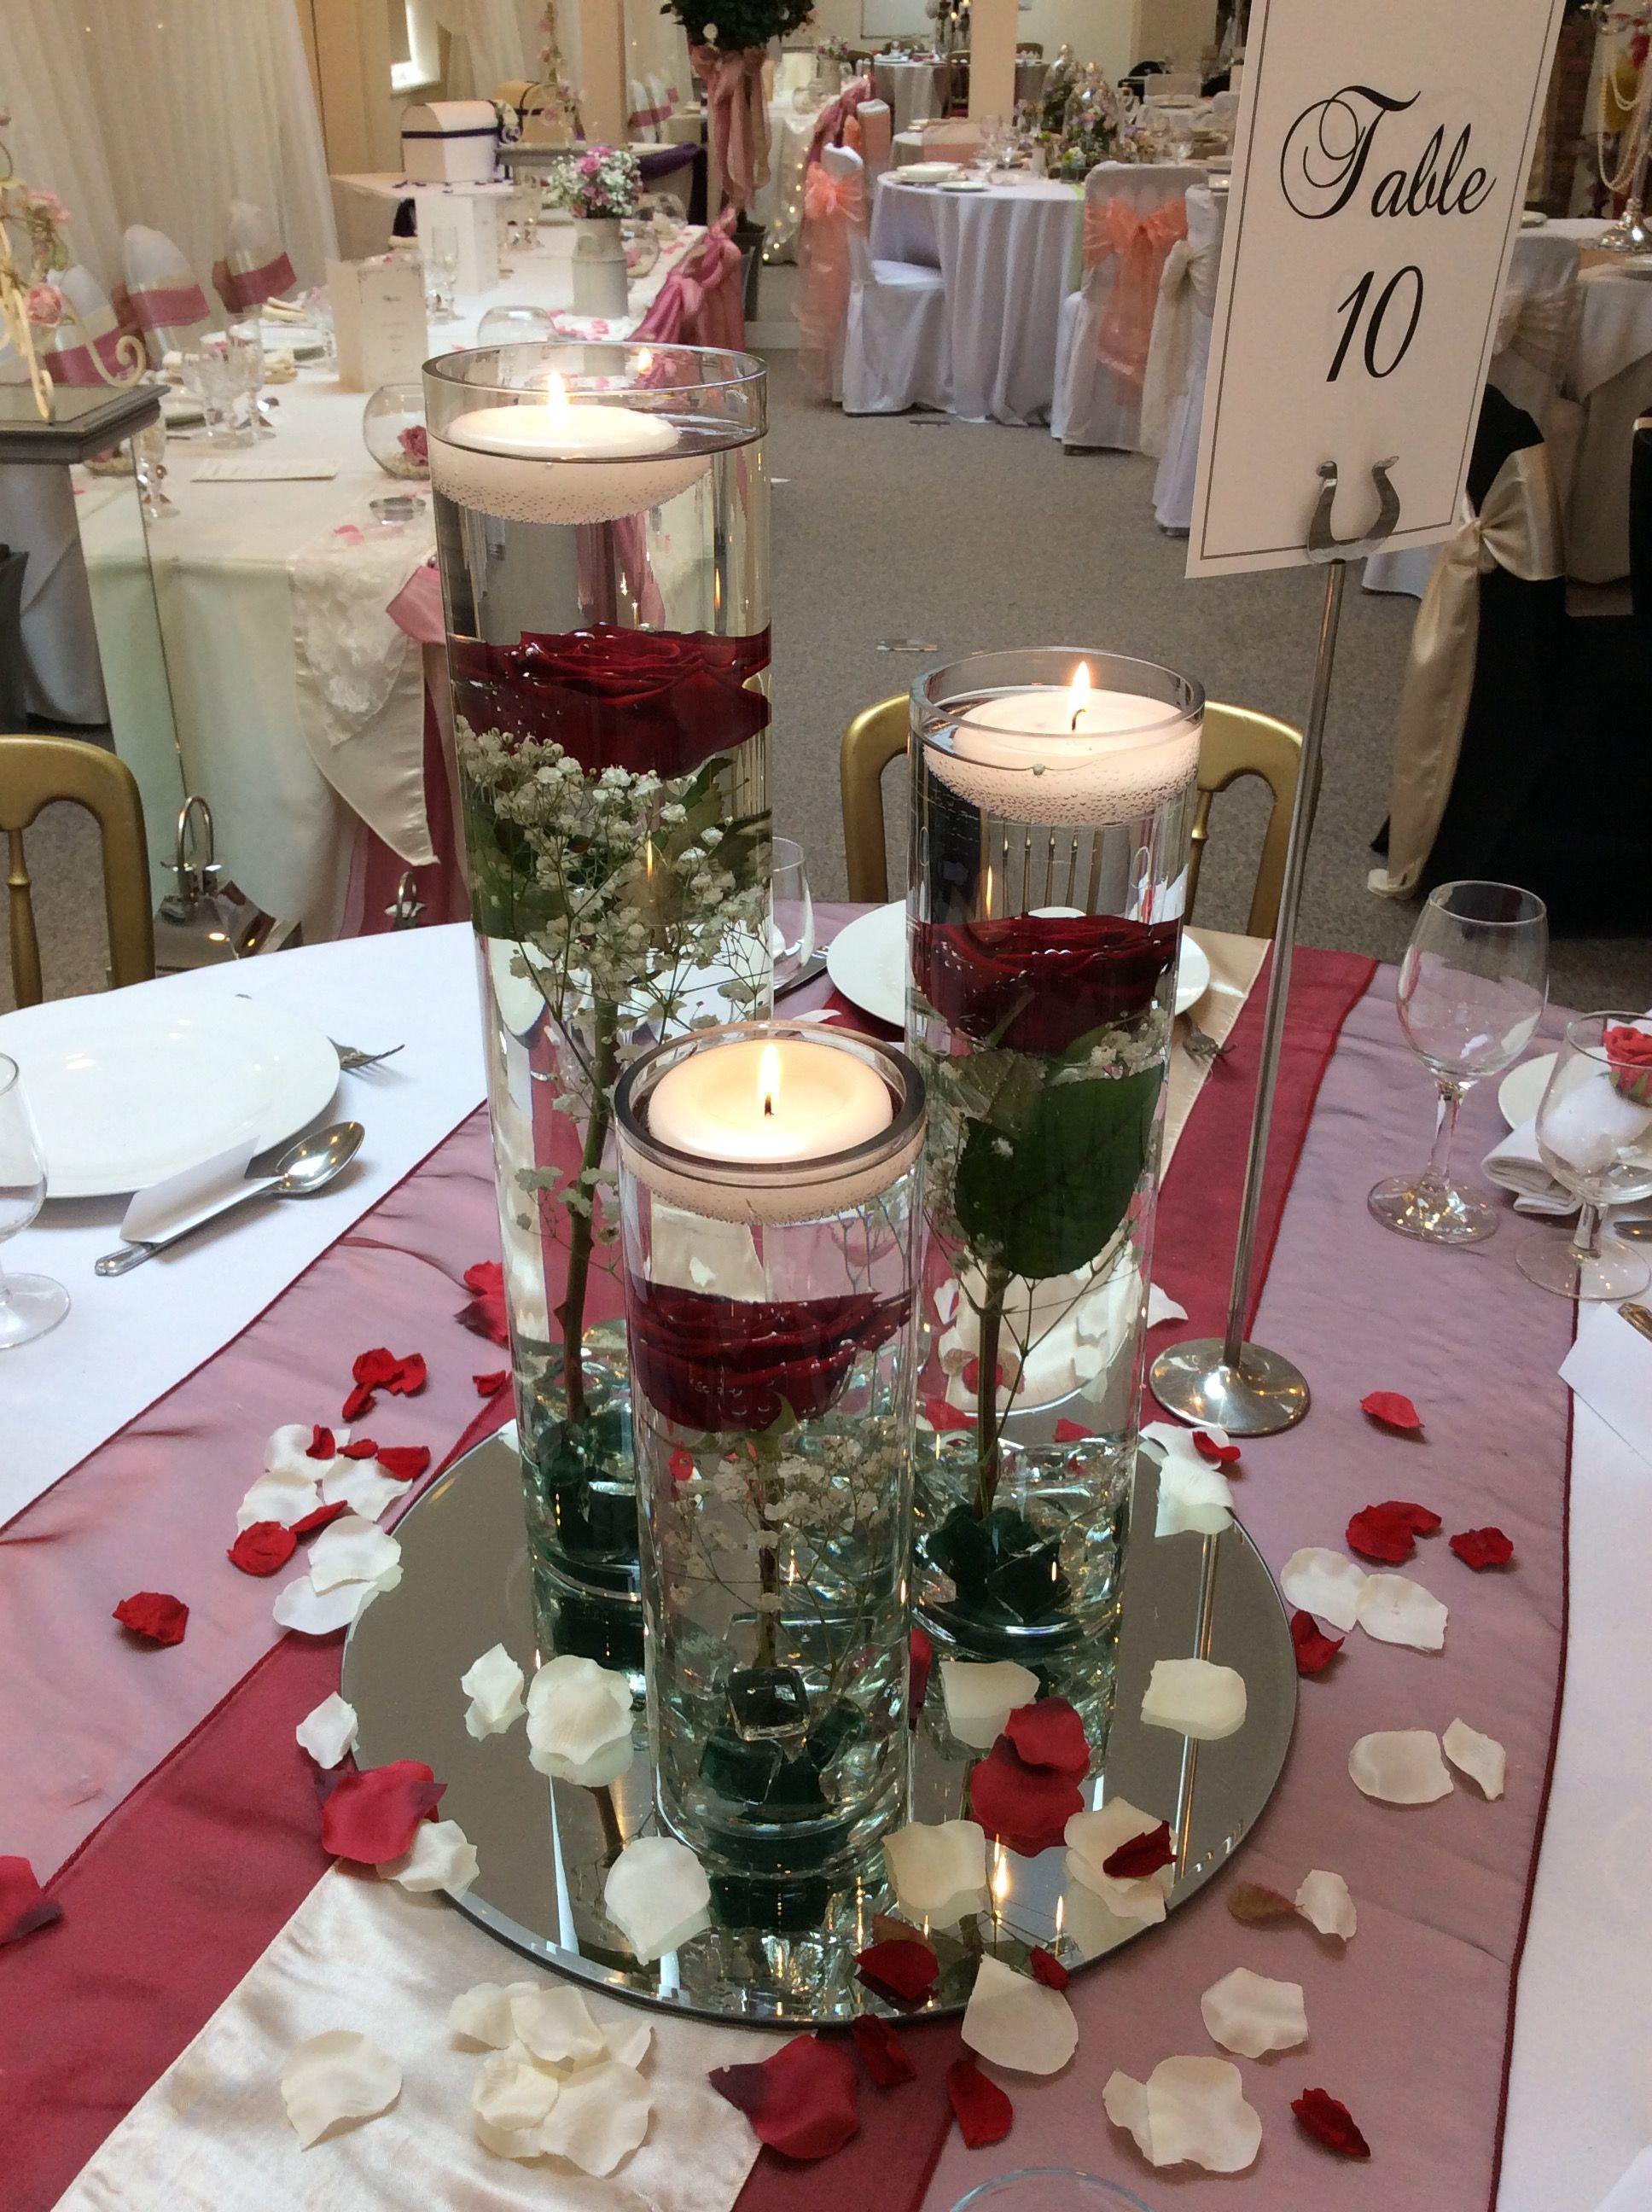 Triple Cylinder Vase Centrepiece With Roses And Gypsophila By Add Style Uk Cylinder Vase Centerpieces Vase Centerpieces Lily Vases